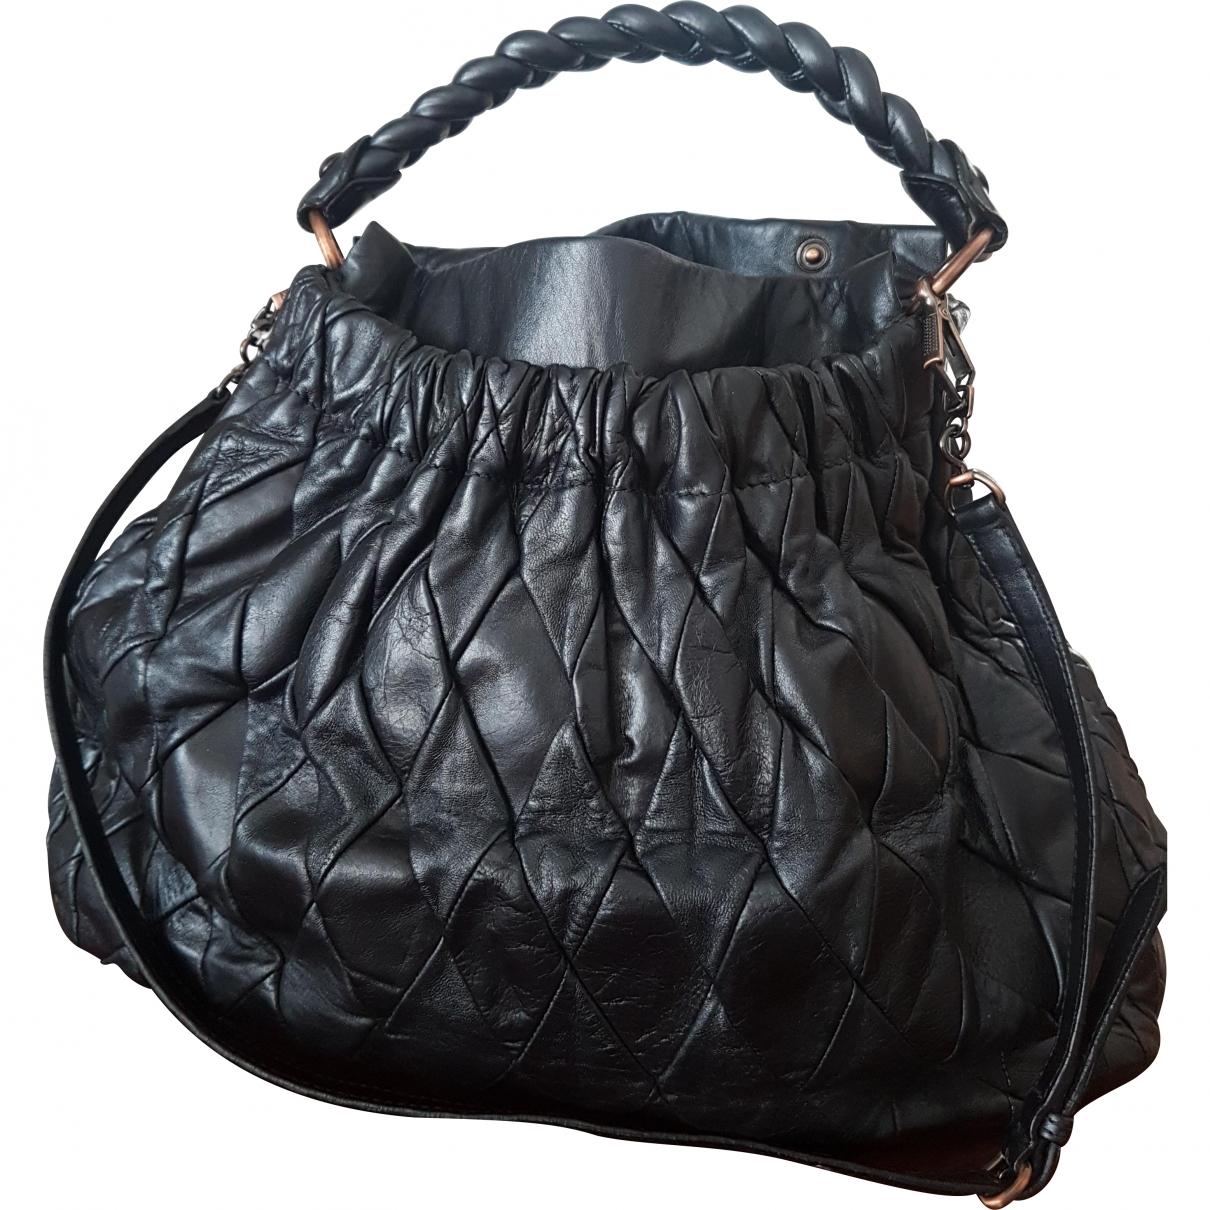 Miu Miu \N Blue Leather handbag for Women \N